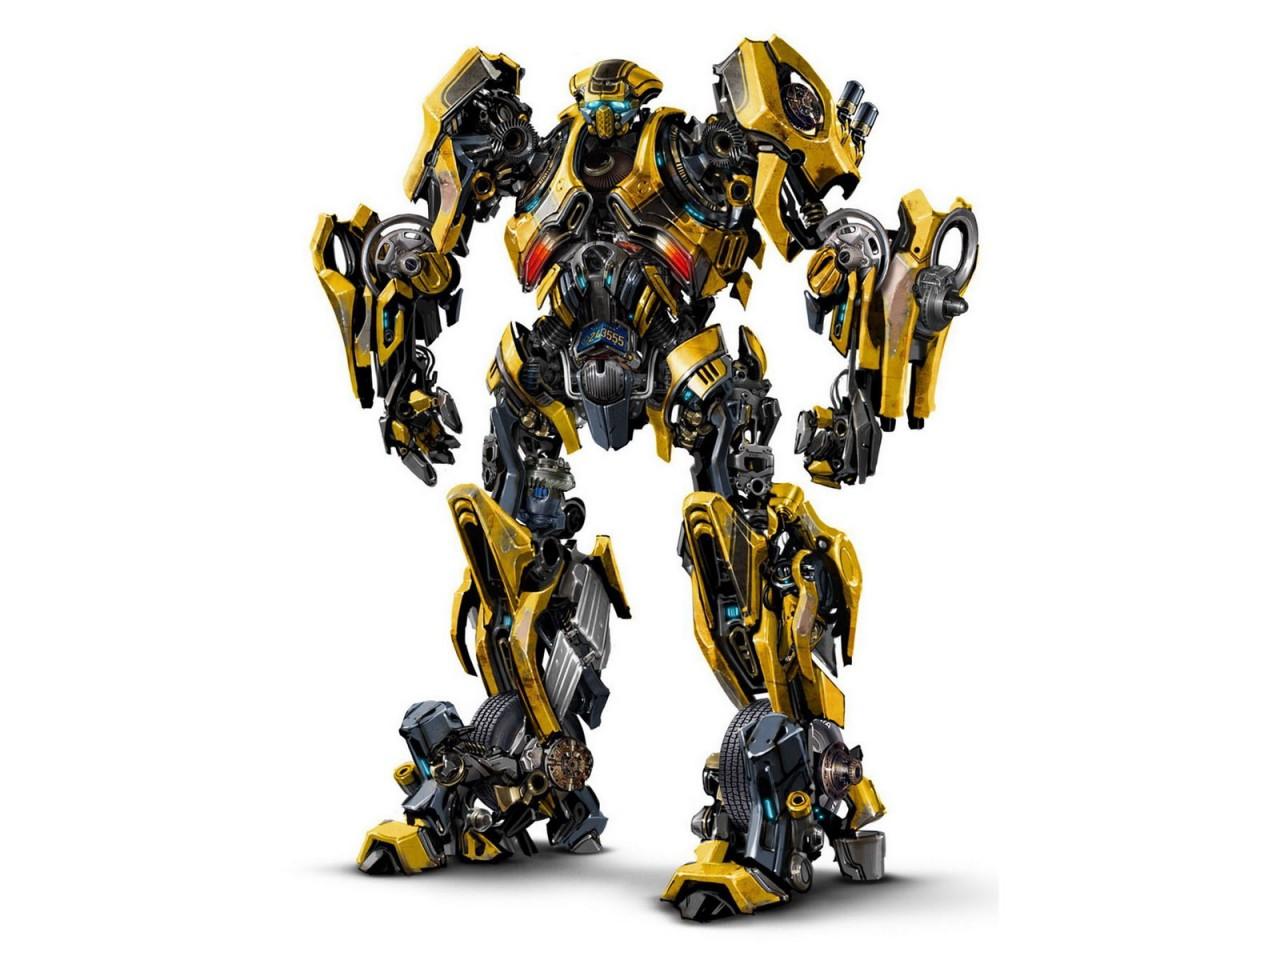 transformers bumblebee hd wallpapers